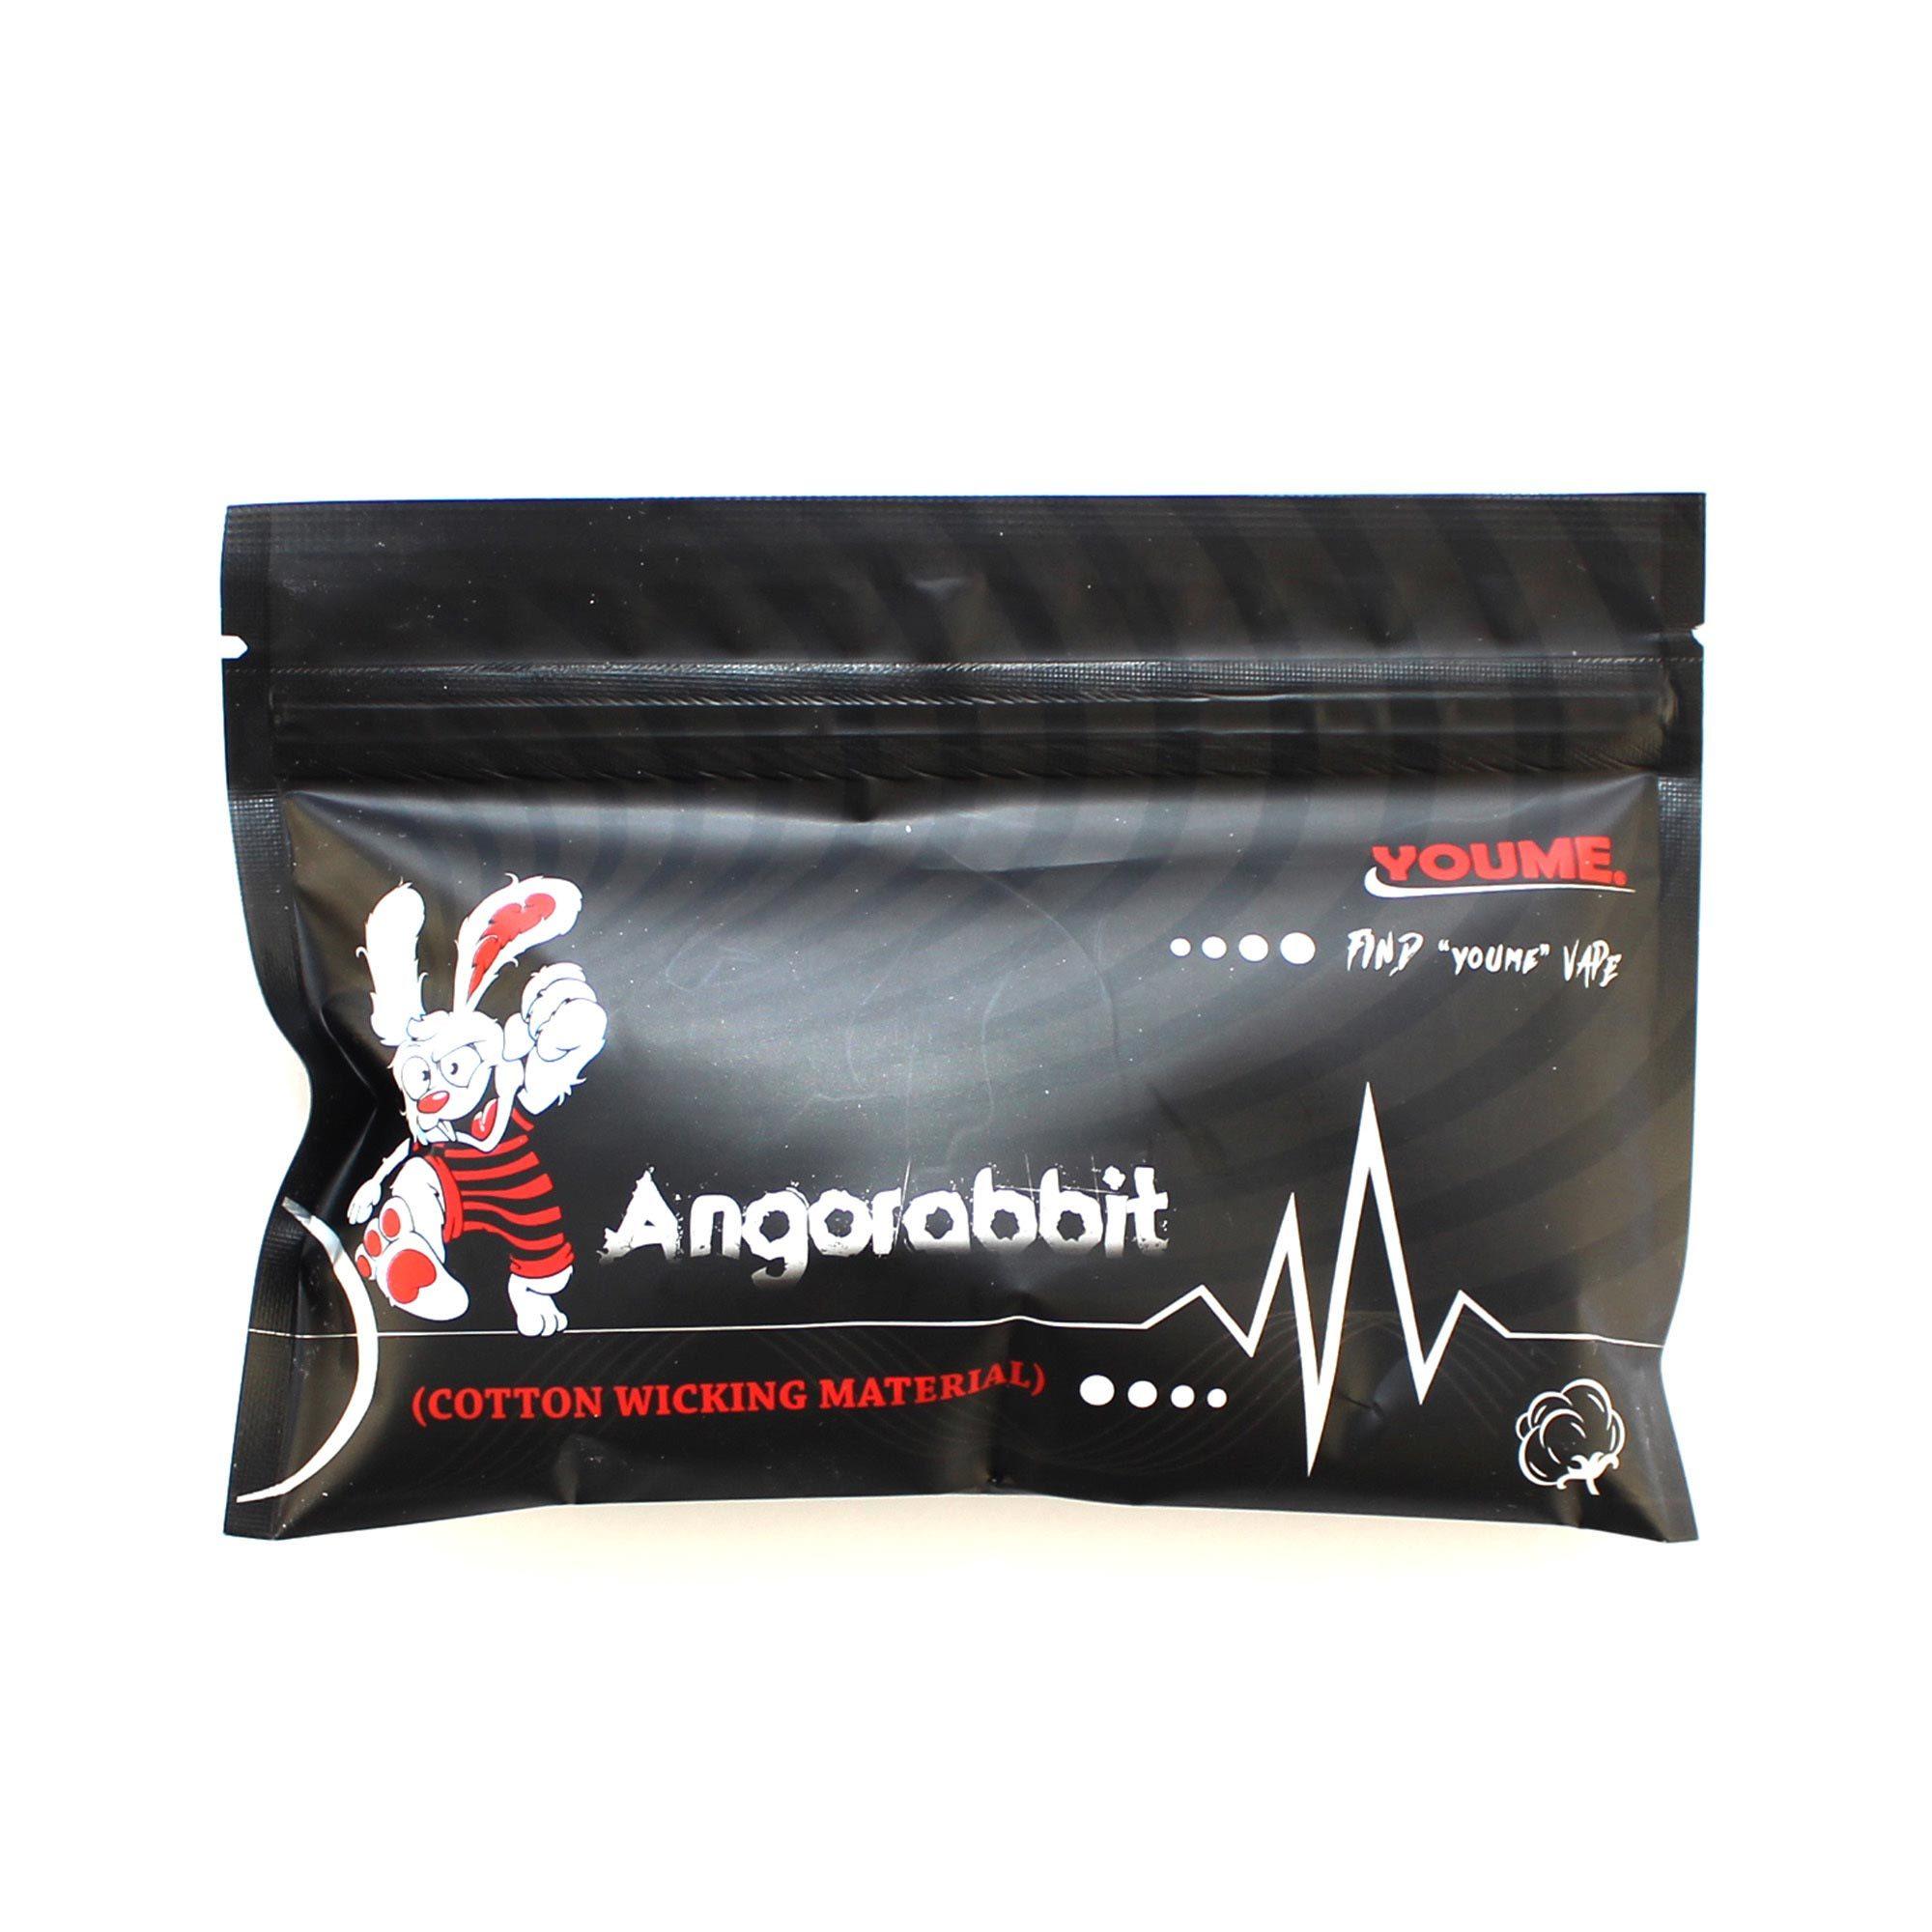 Хлопок Angorabbit